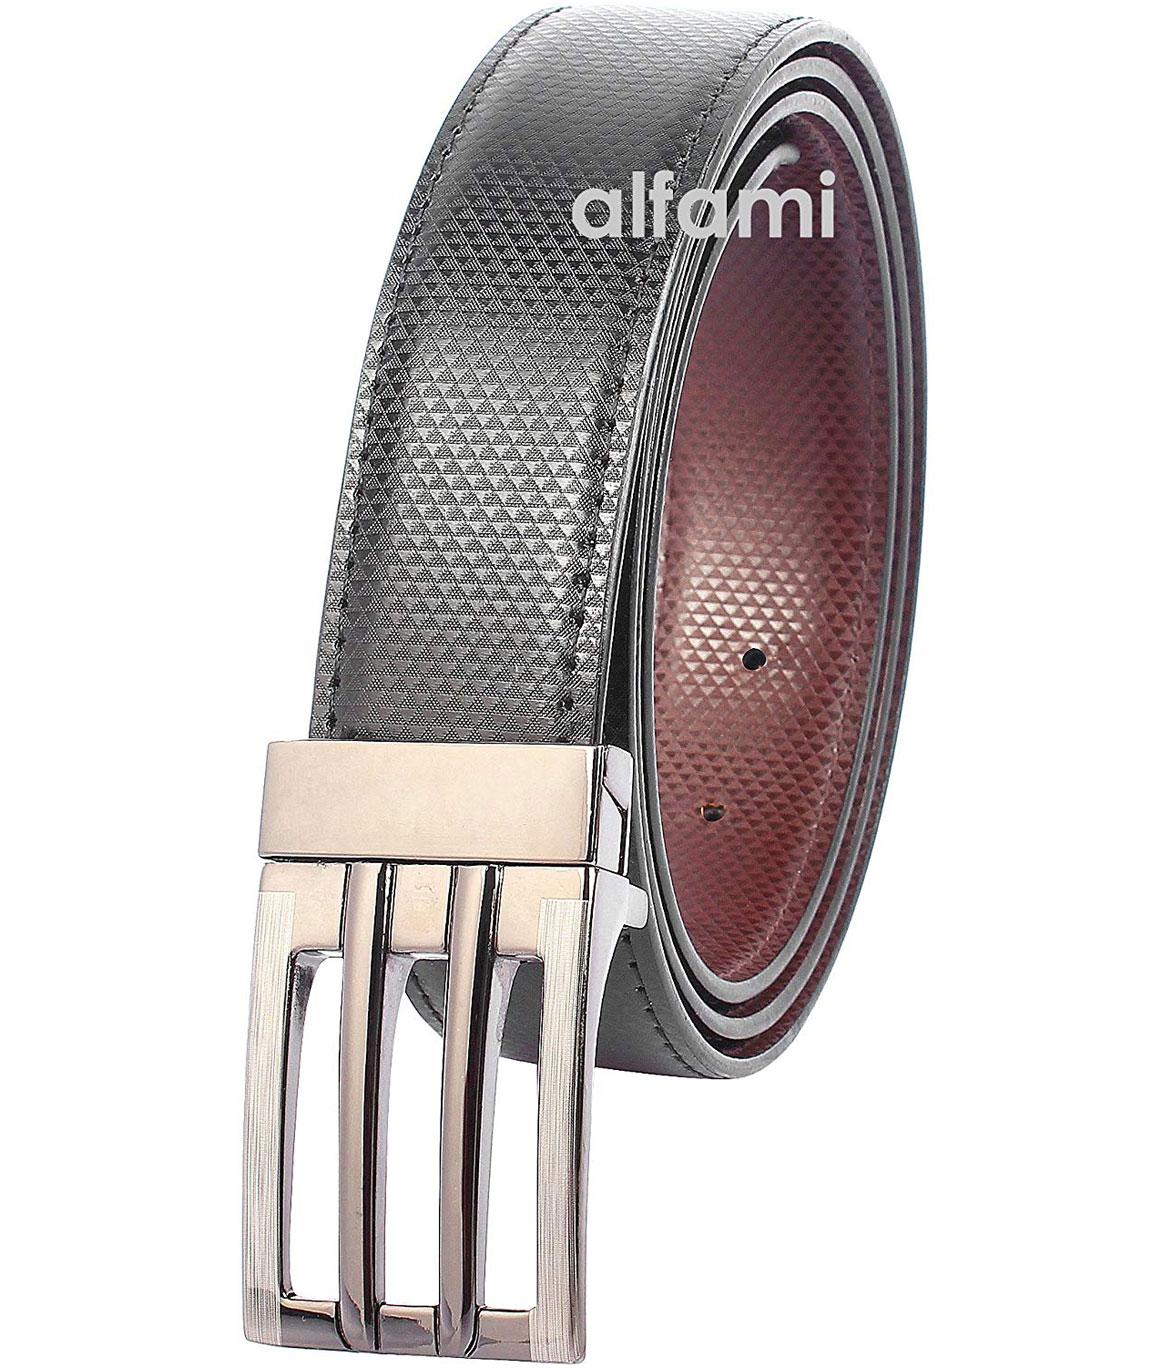 alfami Men`s PU Leather Hook Buckle Reversible Belt (Black/Brown Free Size Upto 42-inch Waist)